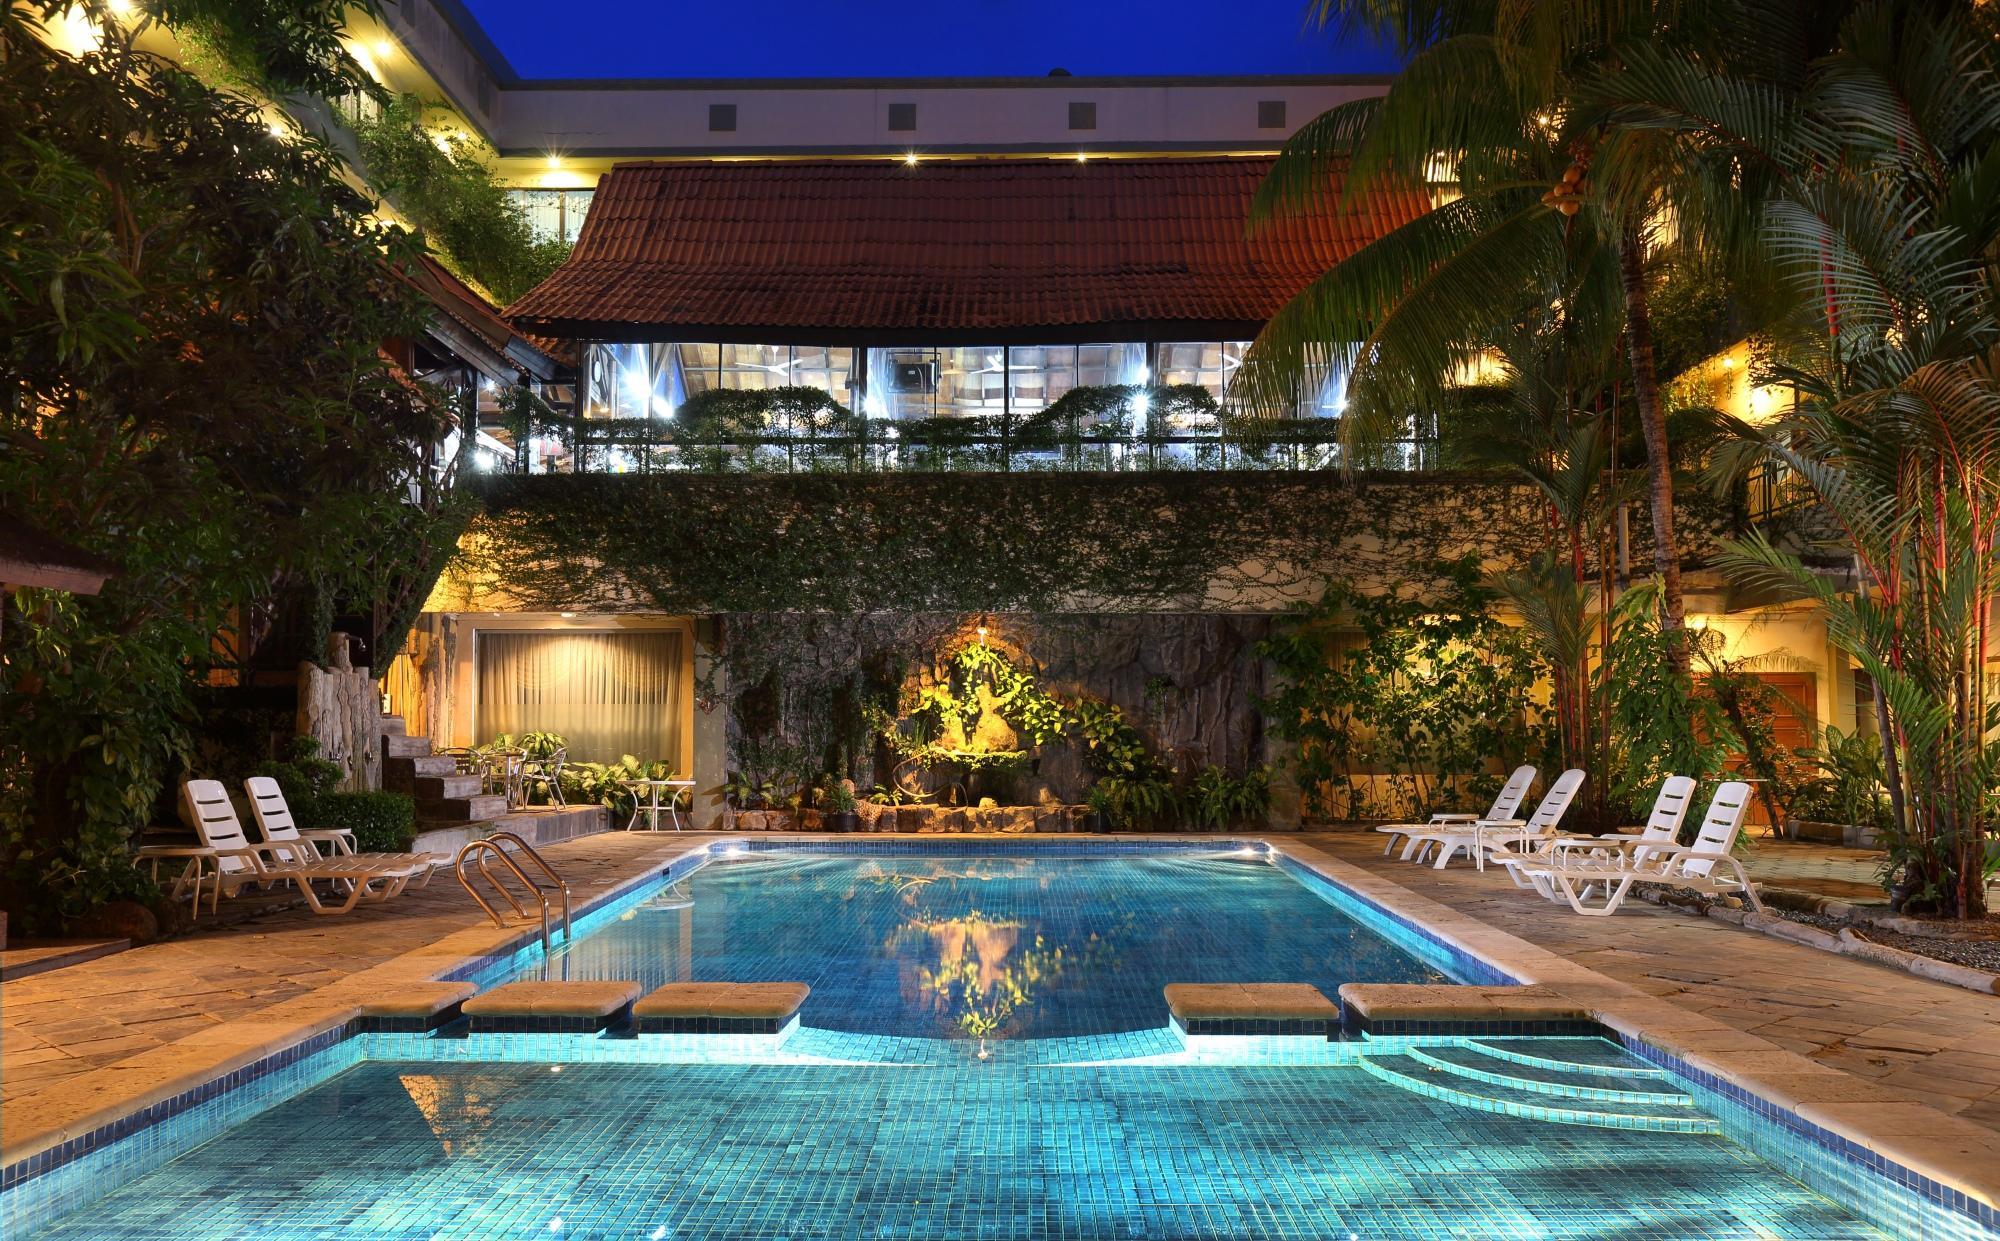 Goodway Hotel - Batam